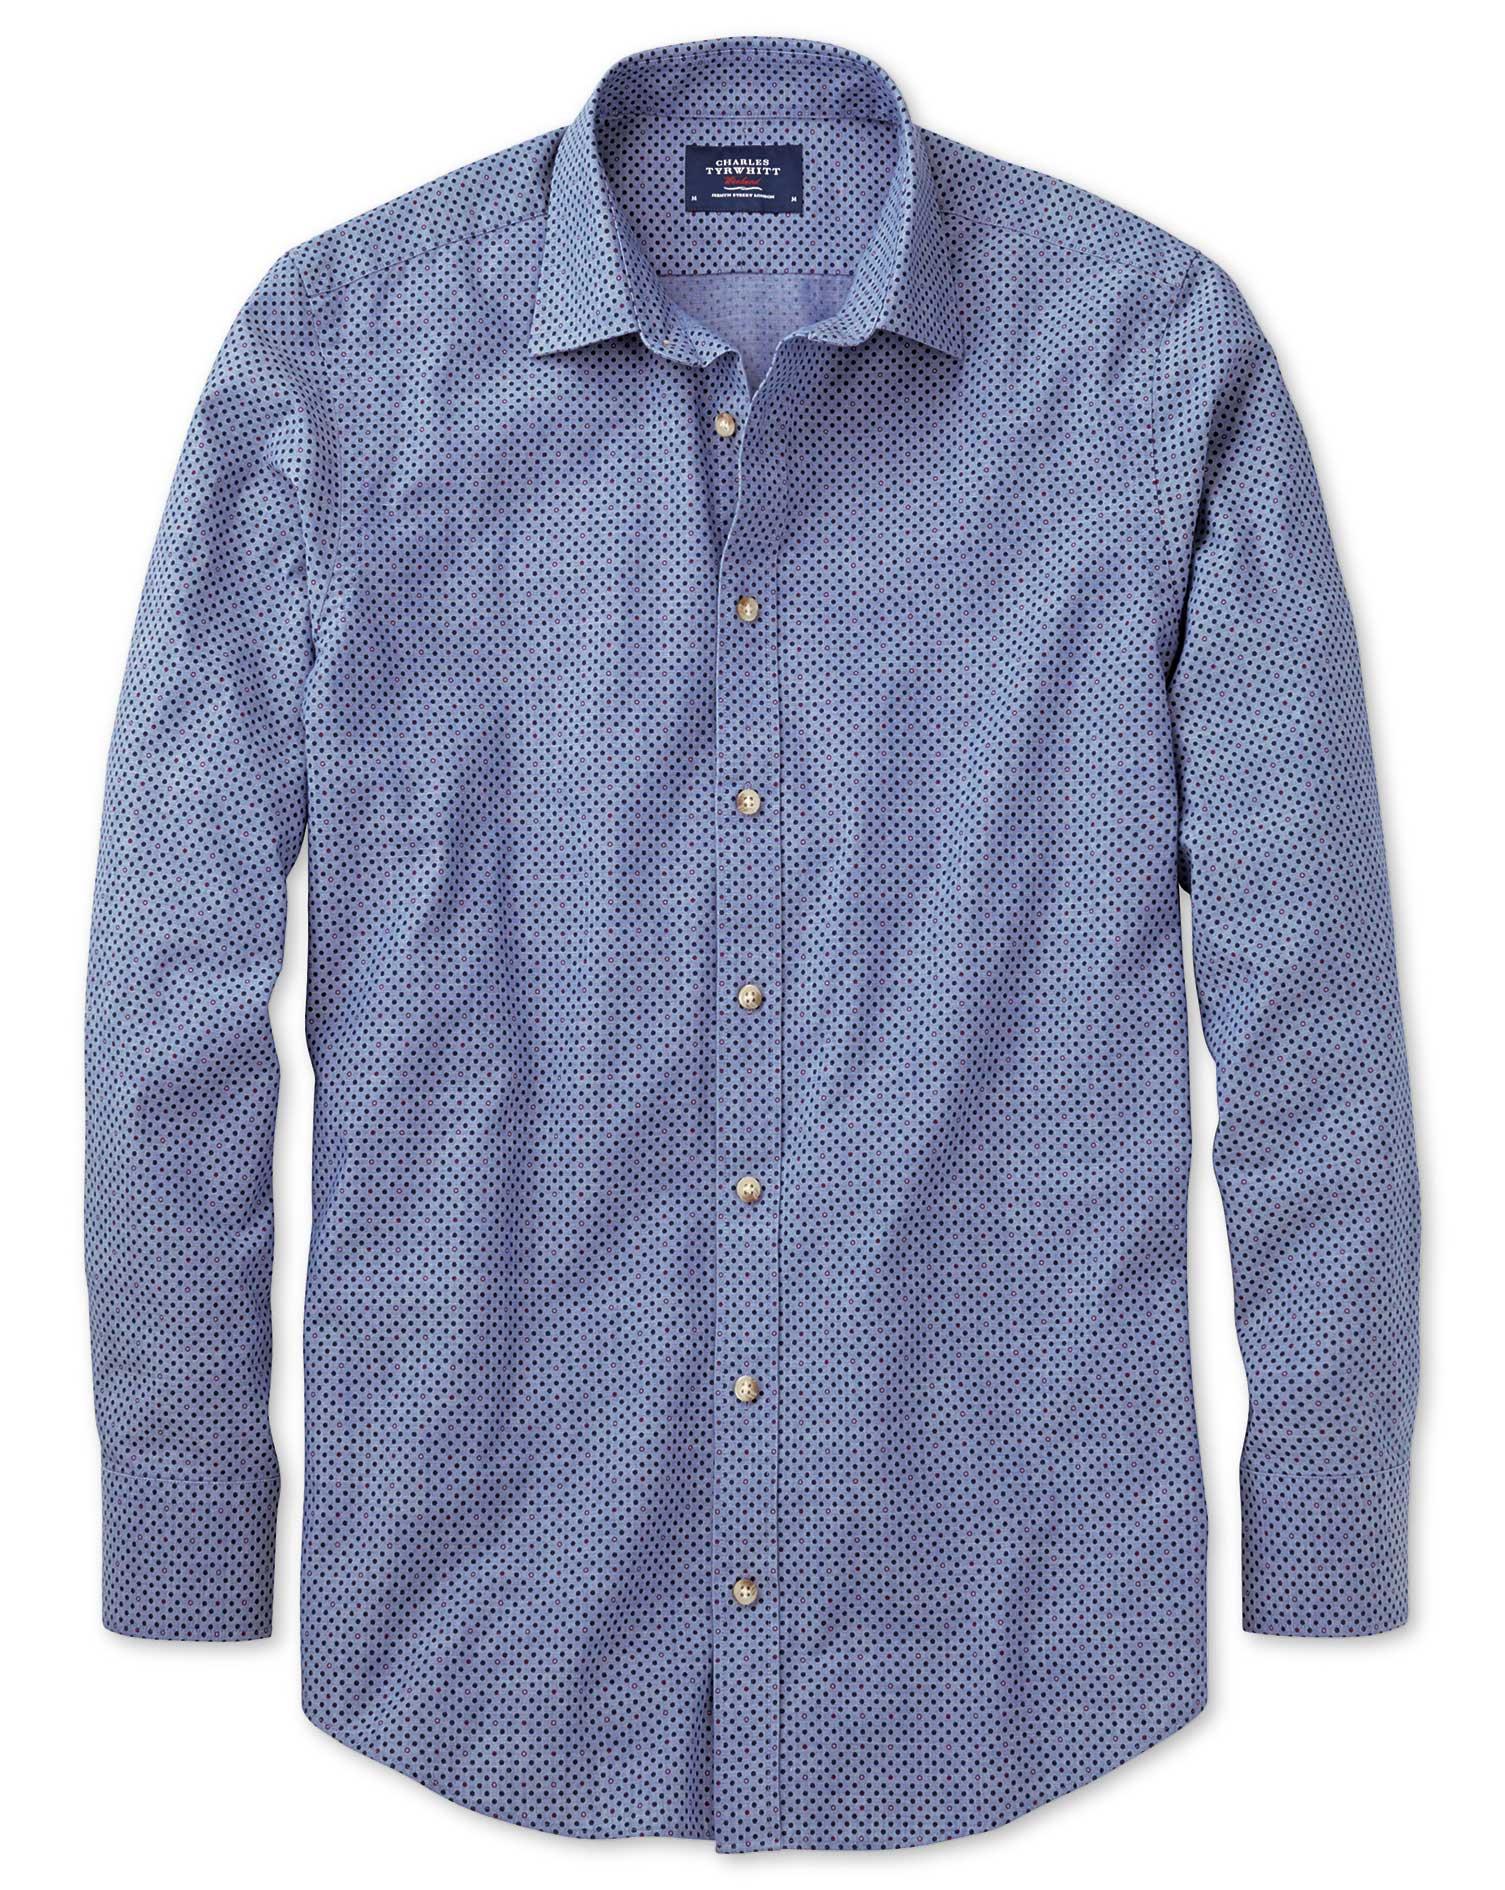 Slim Fit Blue and Purple Spot Print Cotton Shirt Single Cuff Size XS by Charles Tyrwhitt